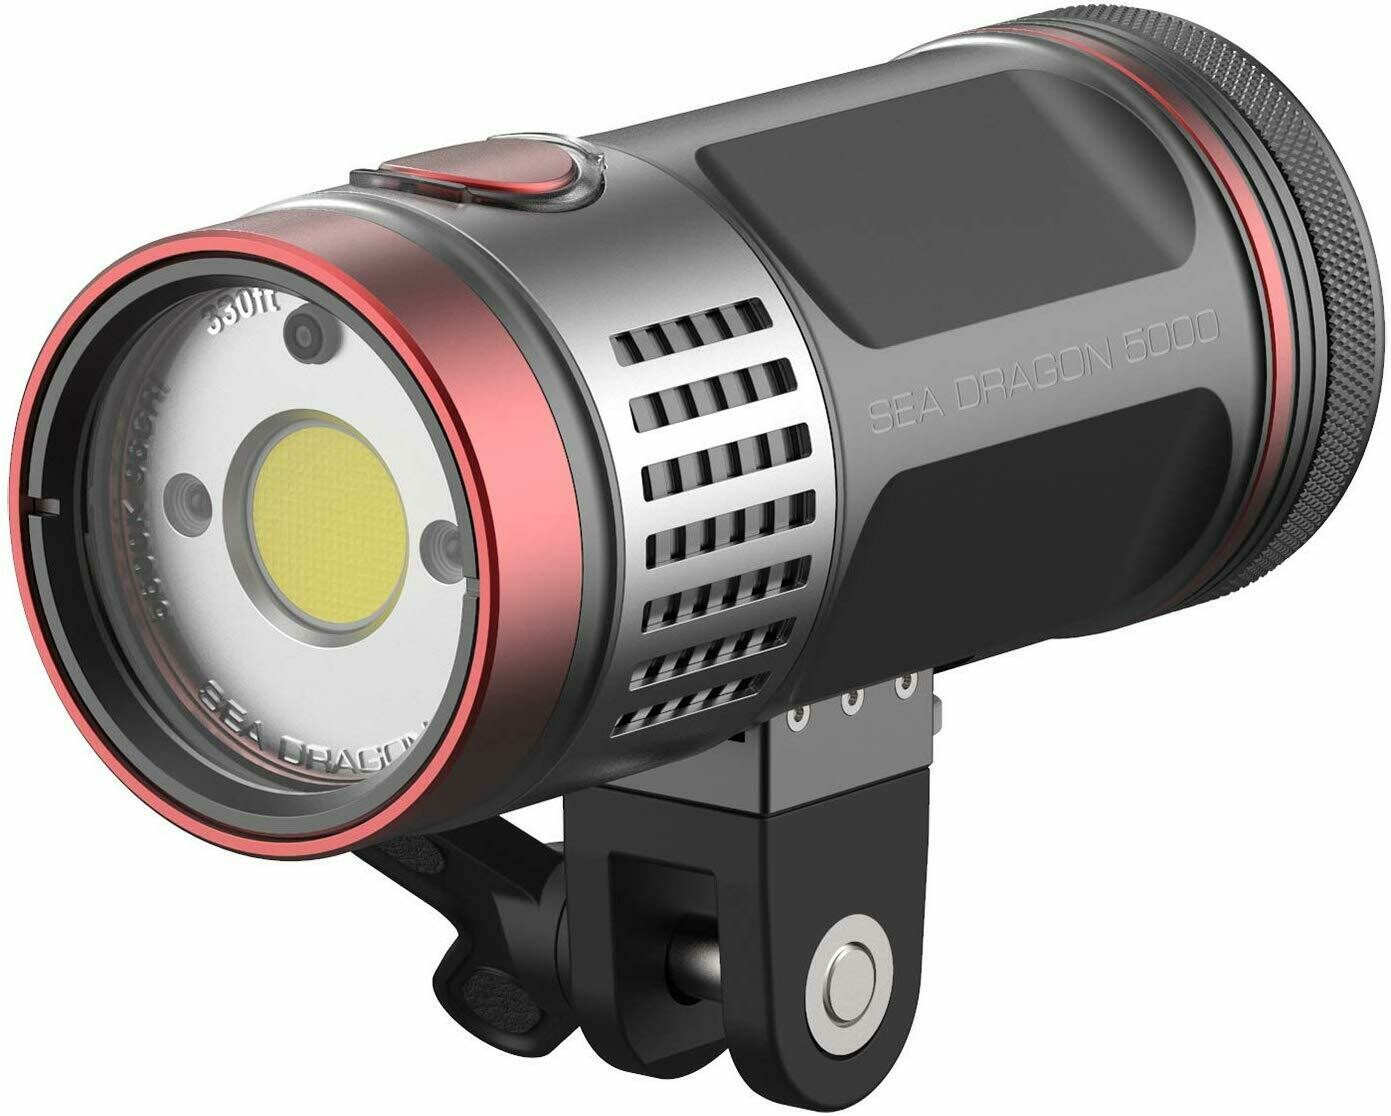 Sea Dragon 5000F Auto Photo-Video Light Head